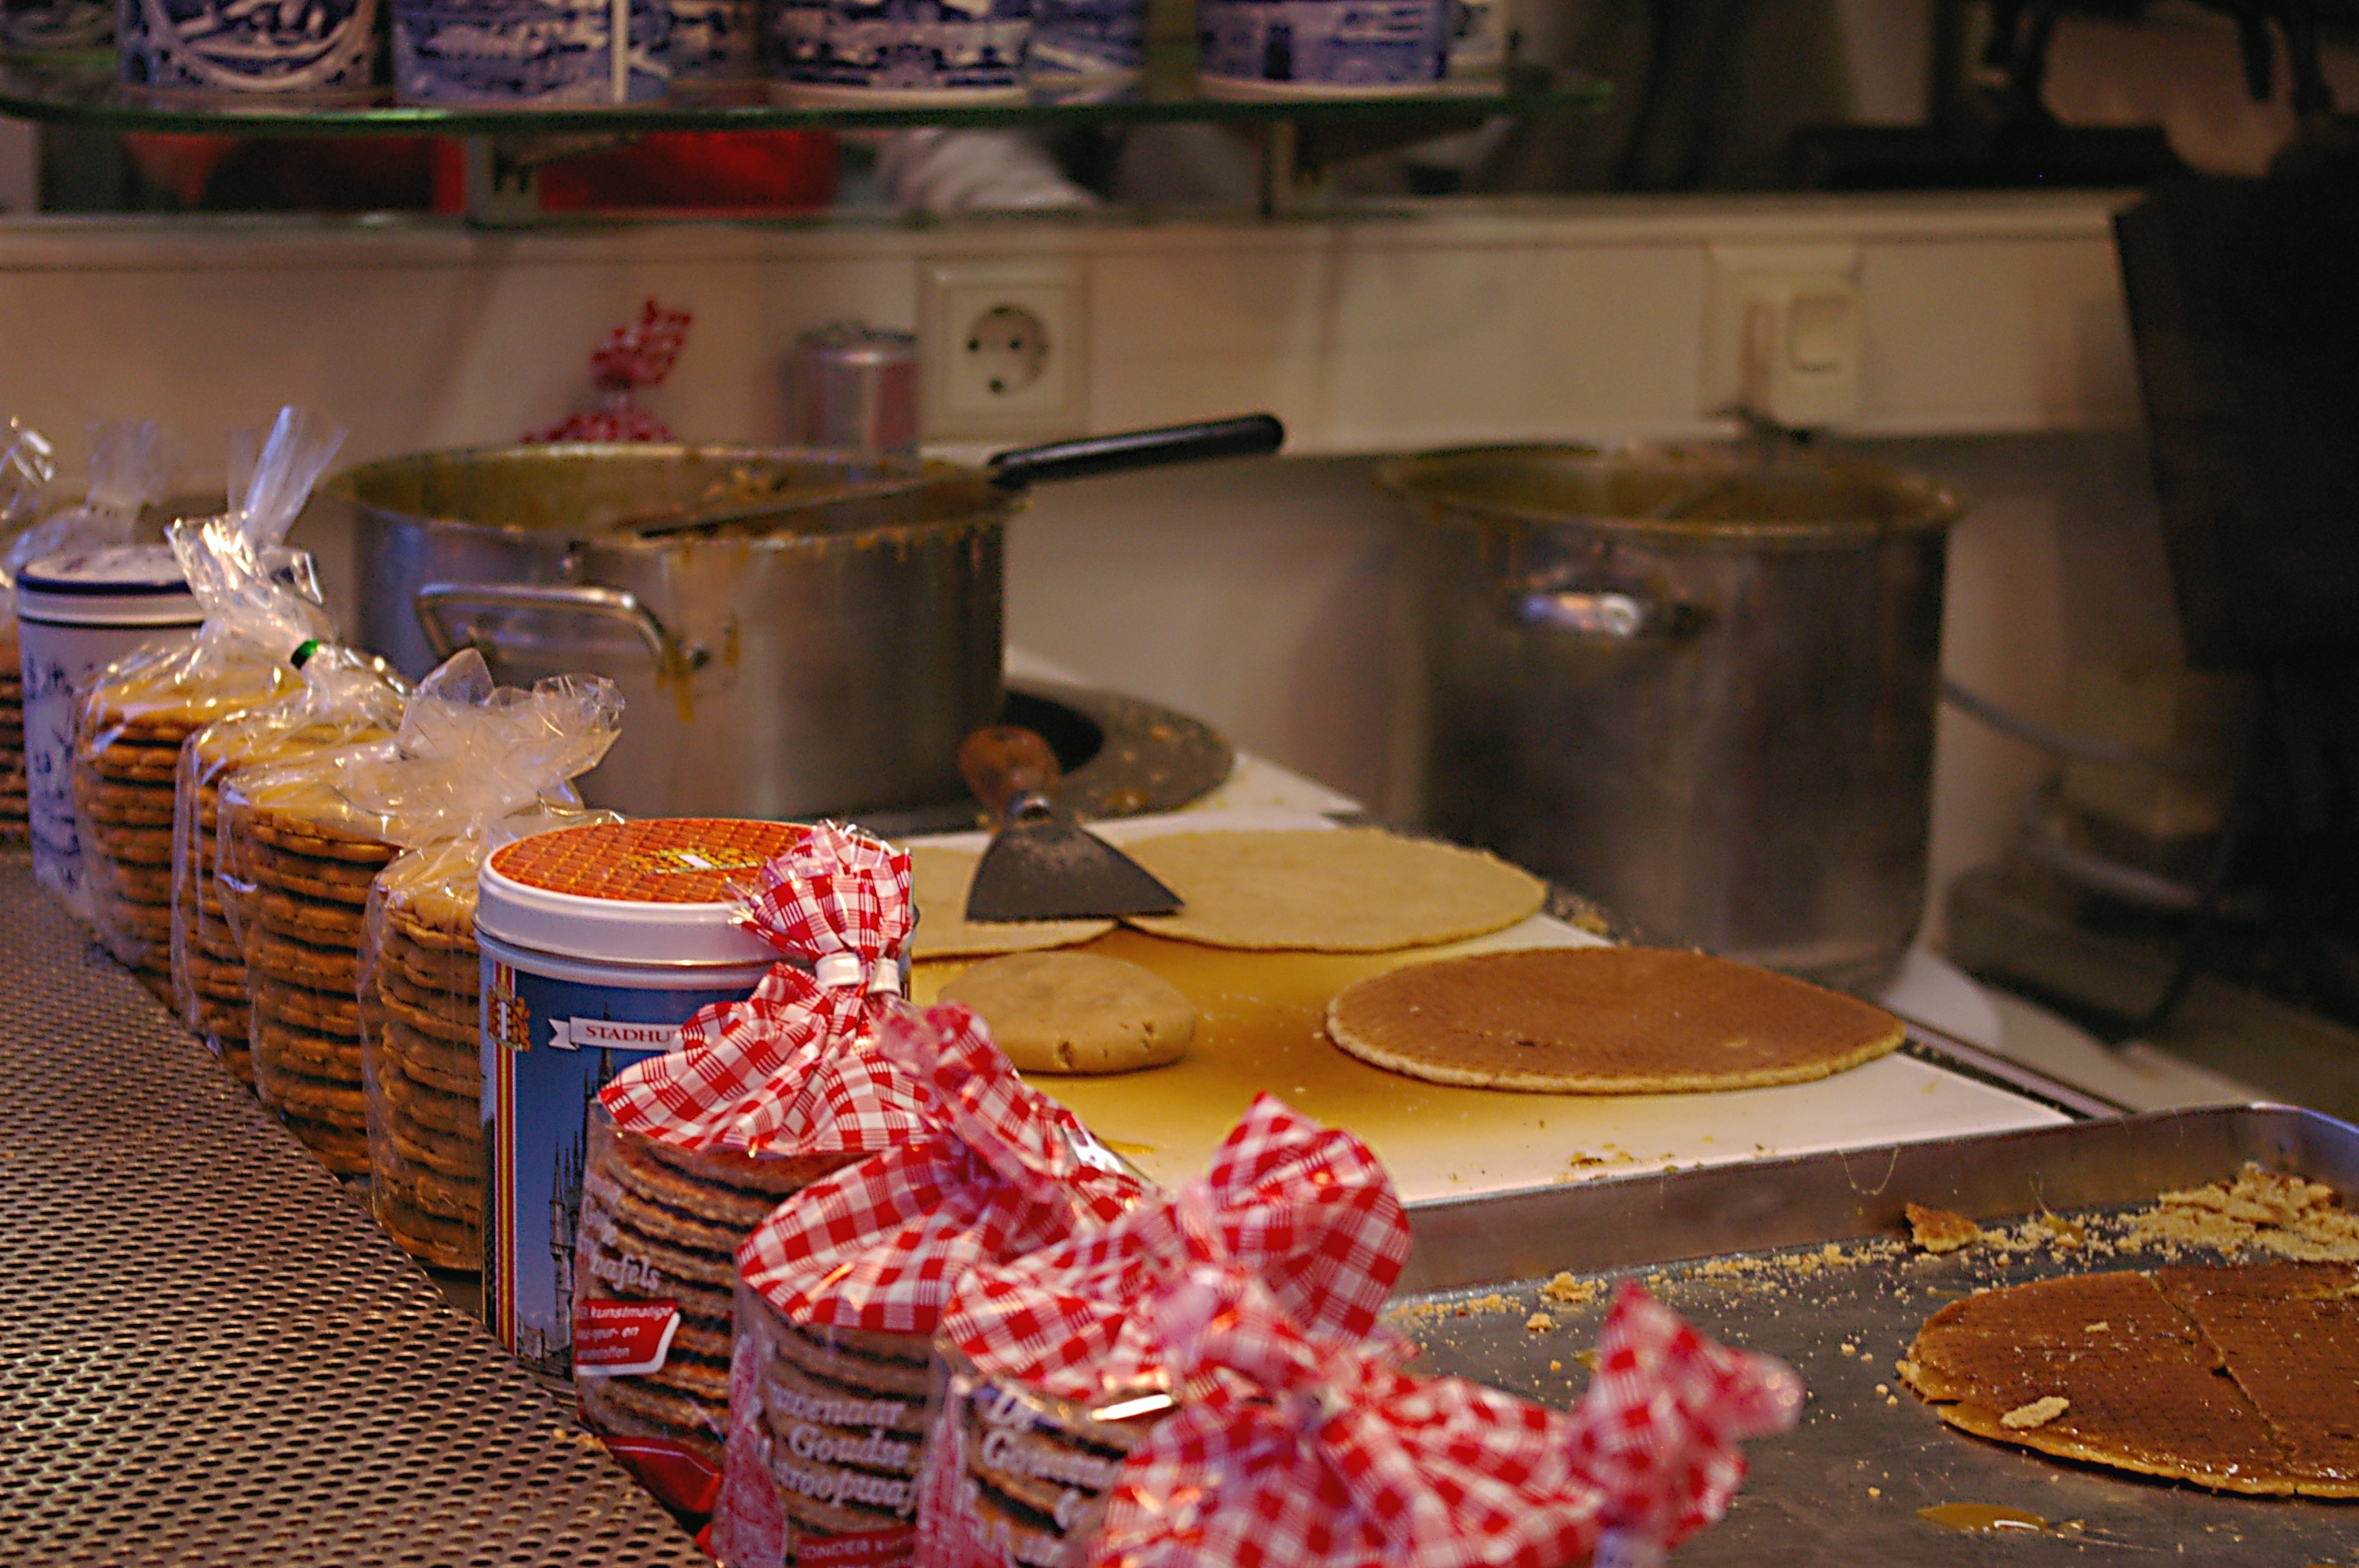 Stroopwafels, must-try street food in Amsterdam.